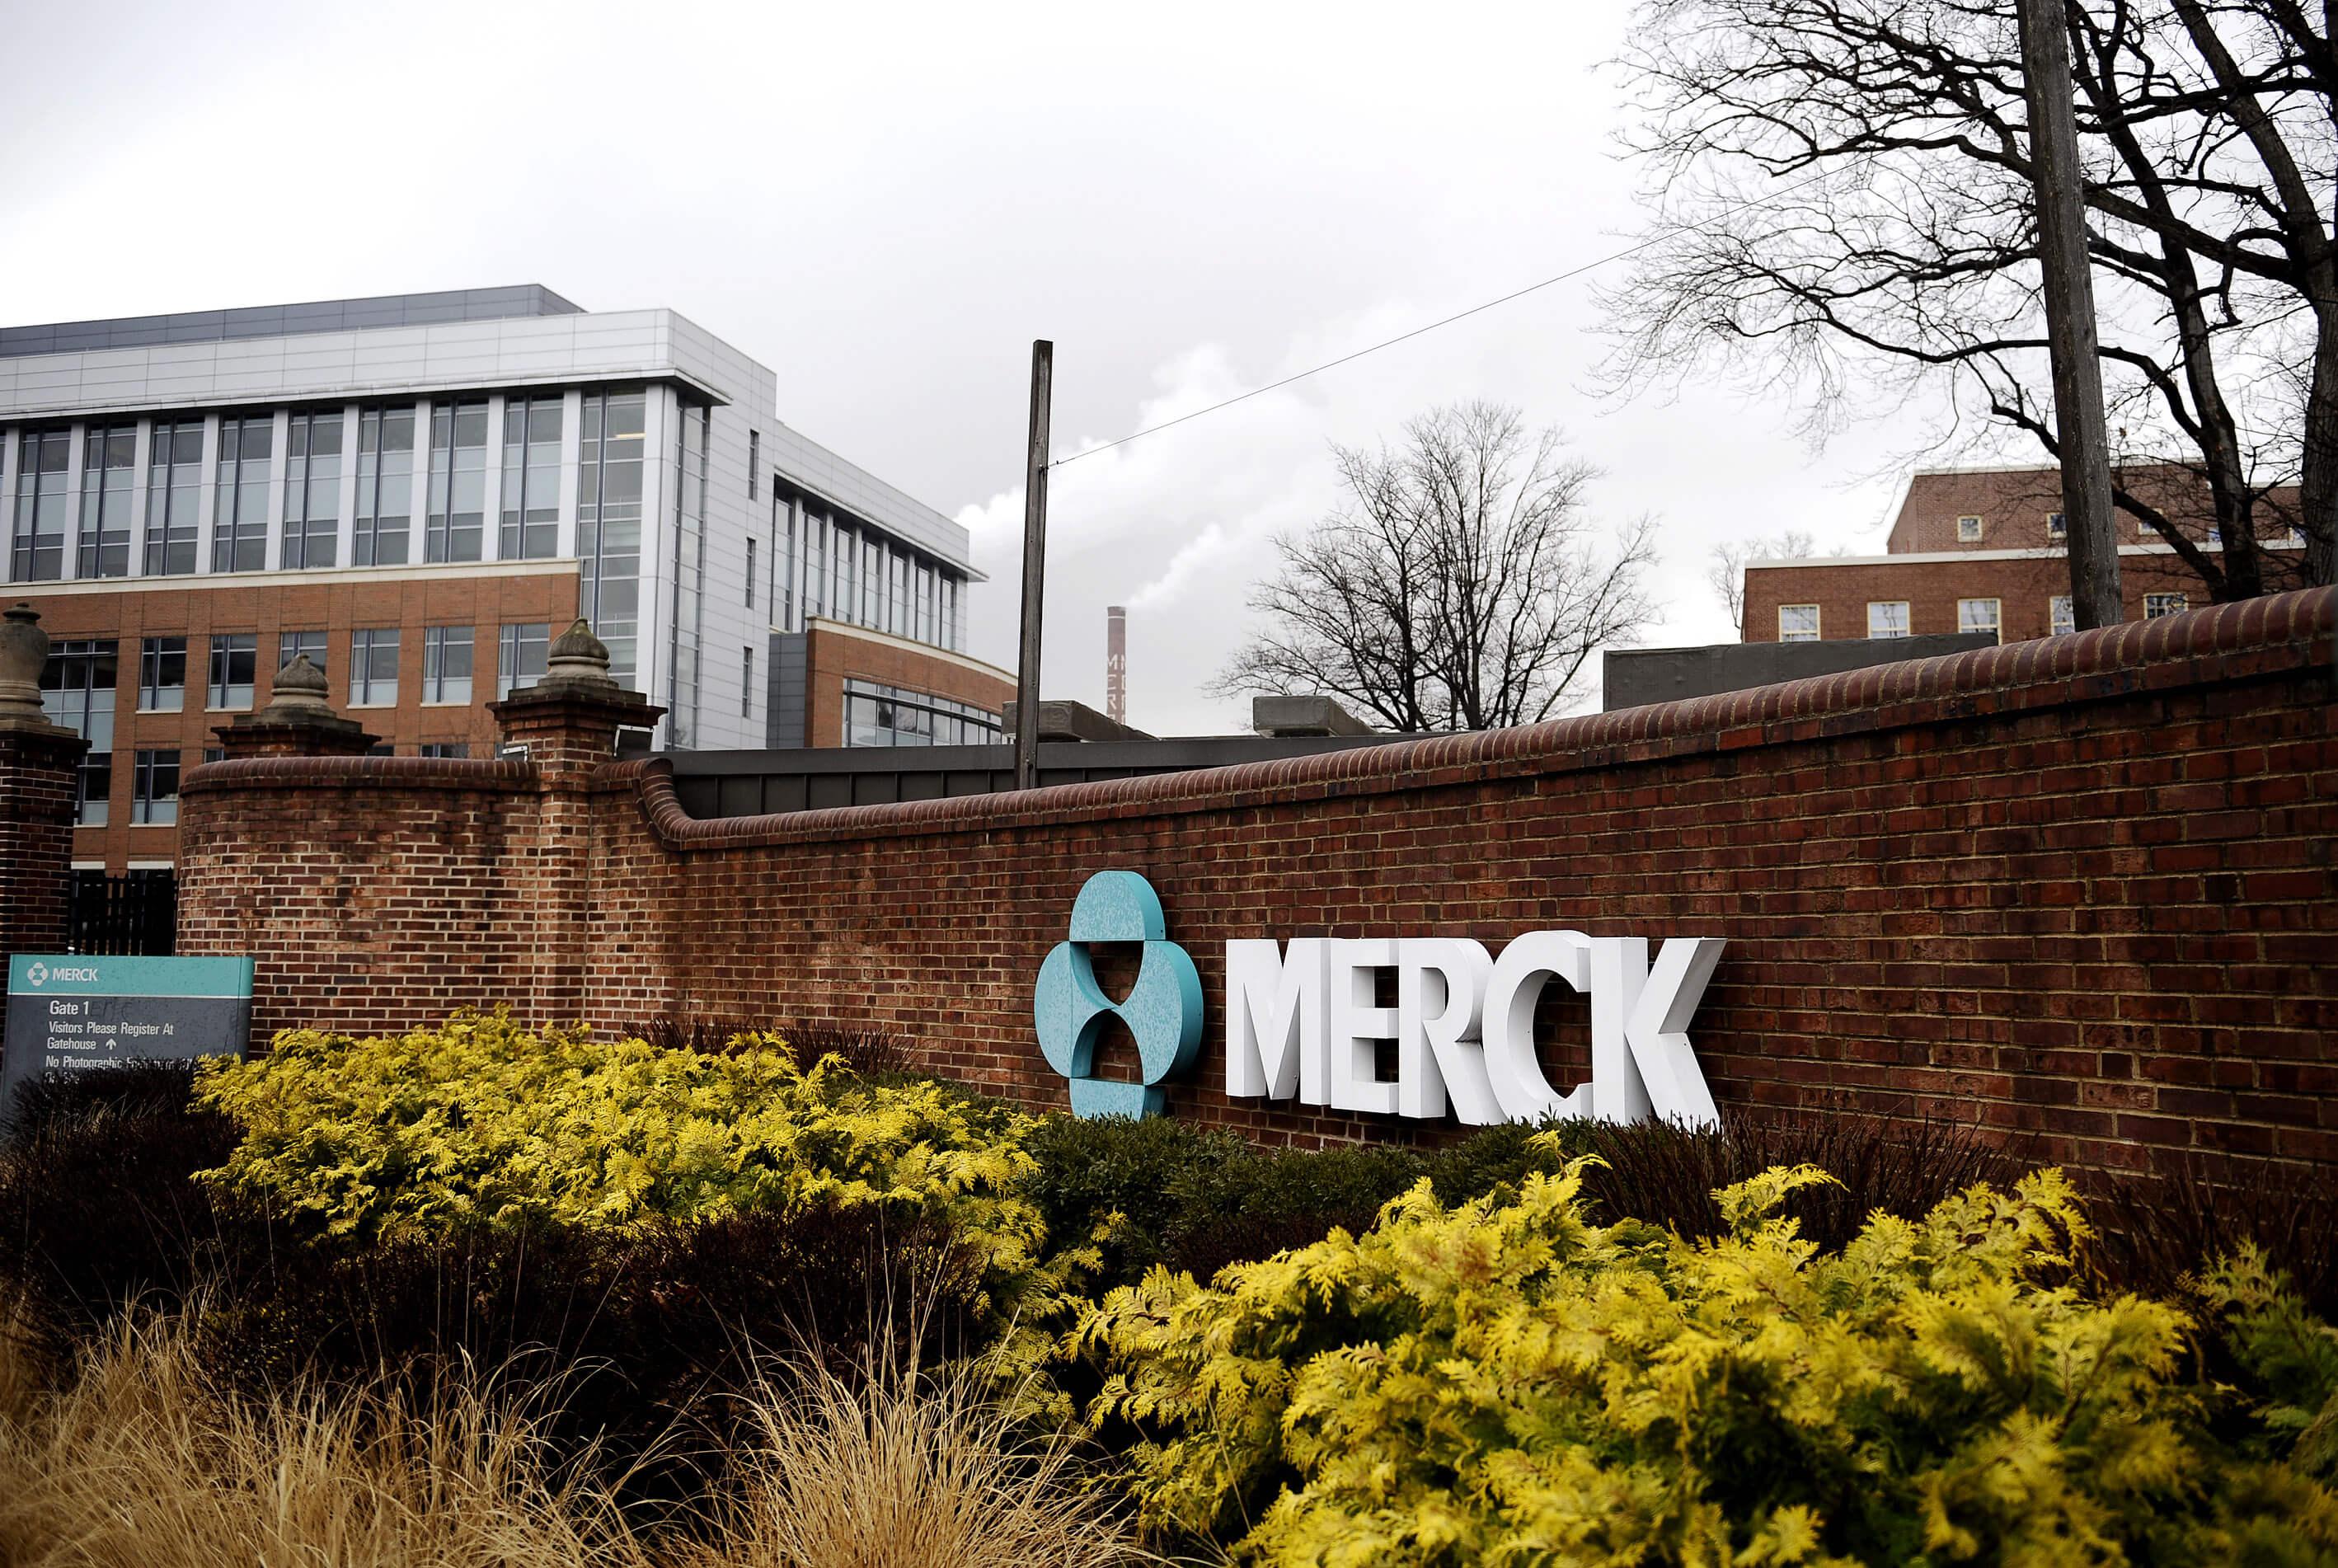 Merck building